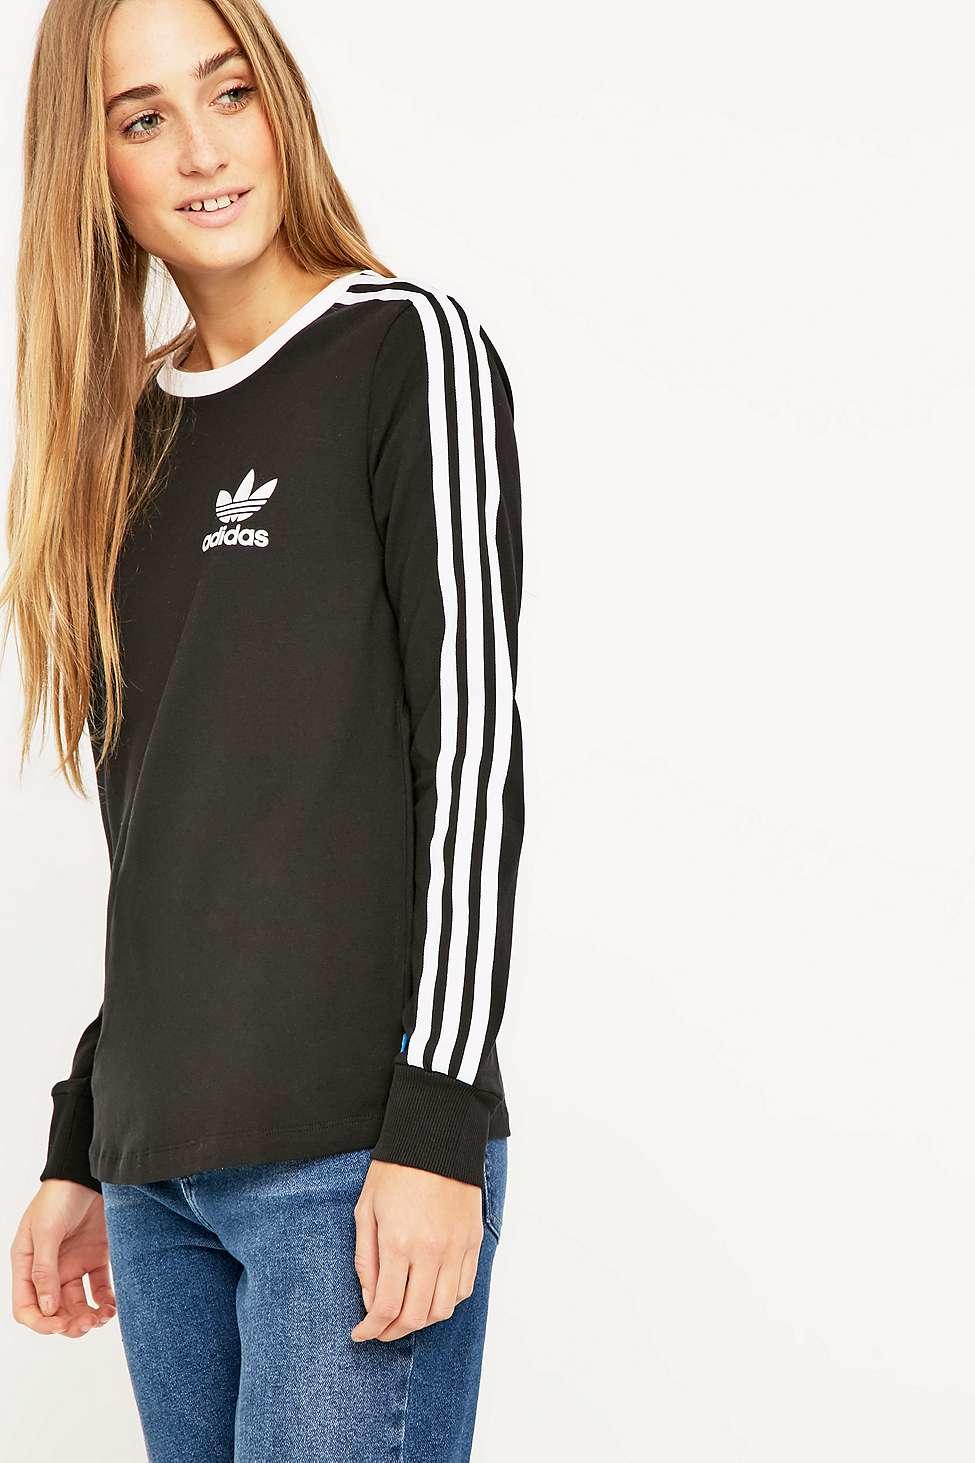 adidas Three Stripe Long Sleeve Black T-shirt in Black - Lyst 9e1b0be804